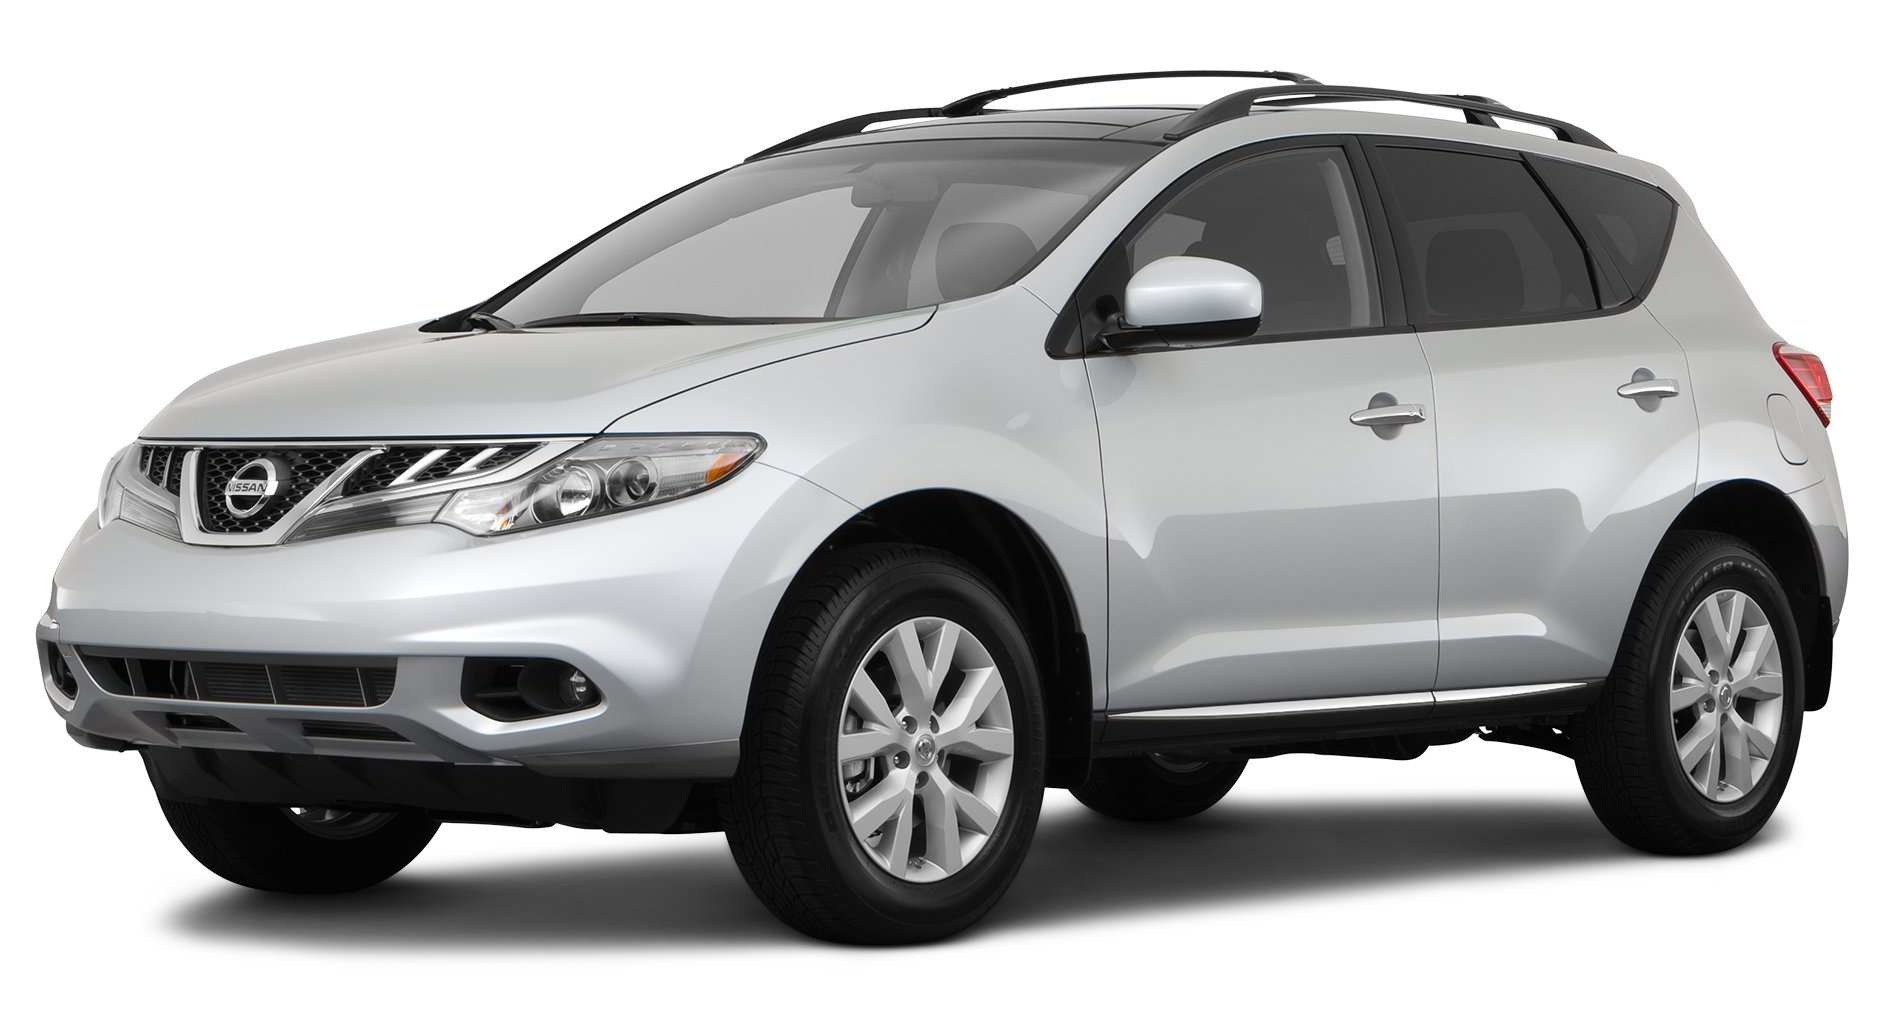 Amazon 2011 Acura RDX Reviews and Specs Vehicles